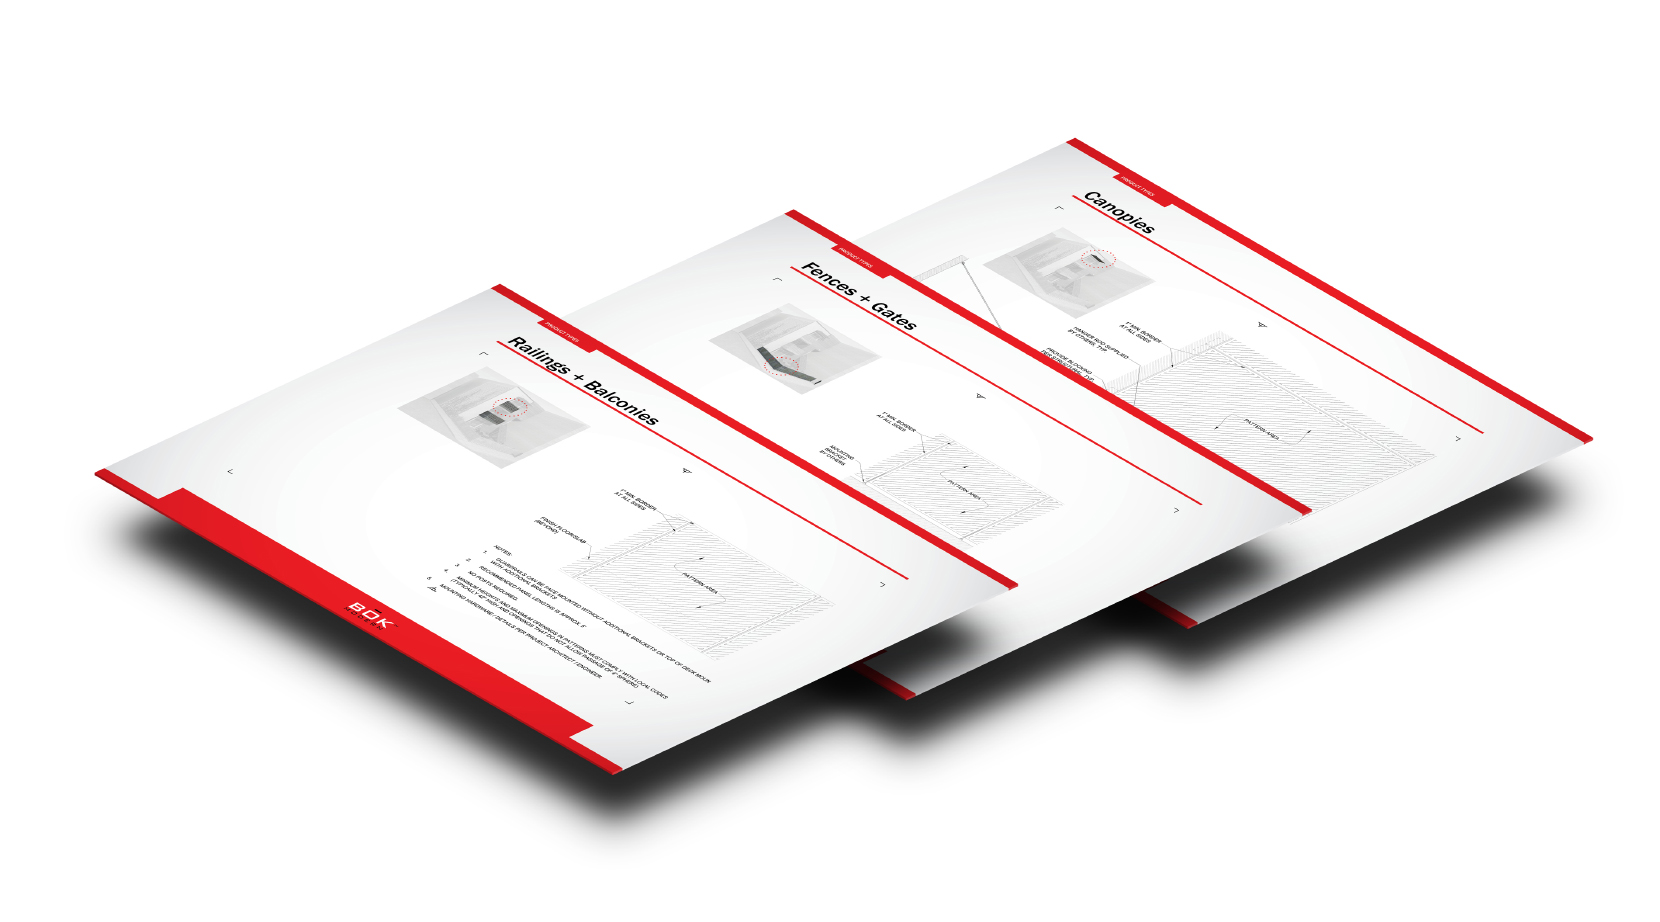 Tablet-Screens-presentation-Mock-up.jpg